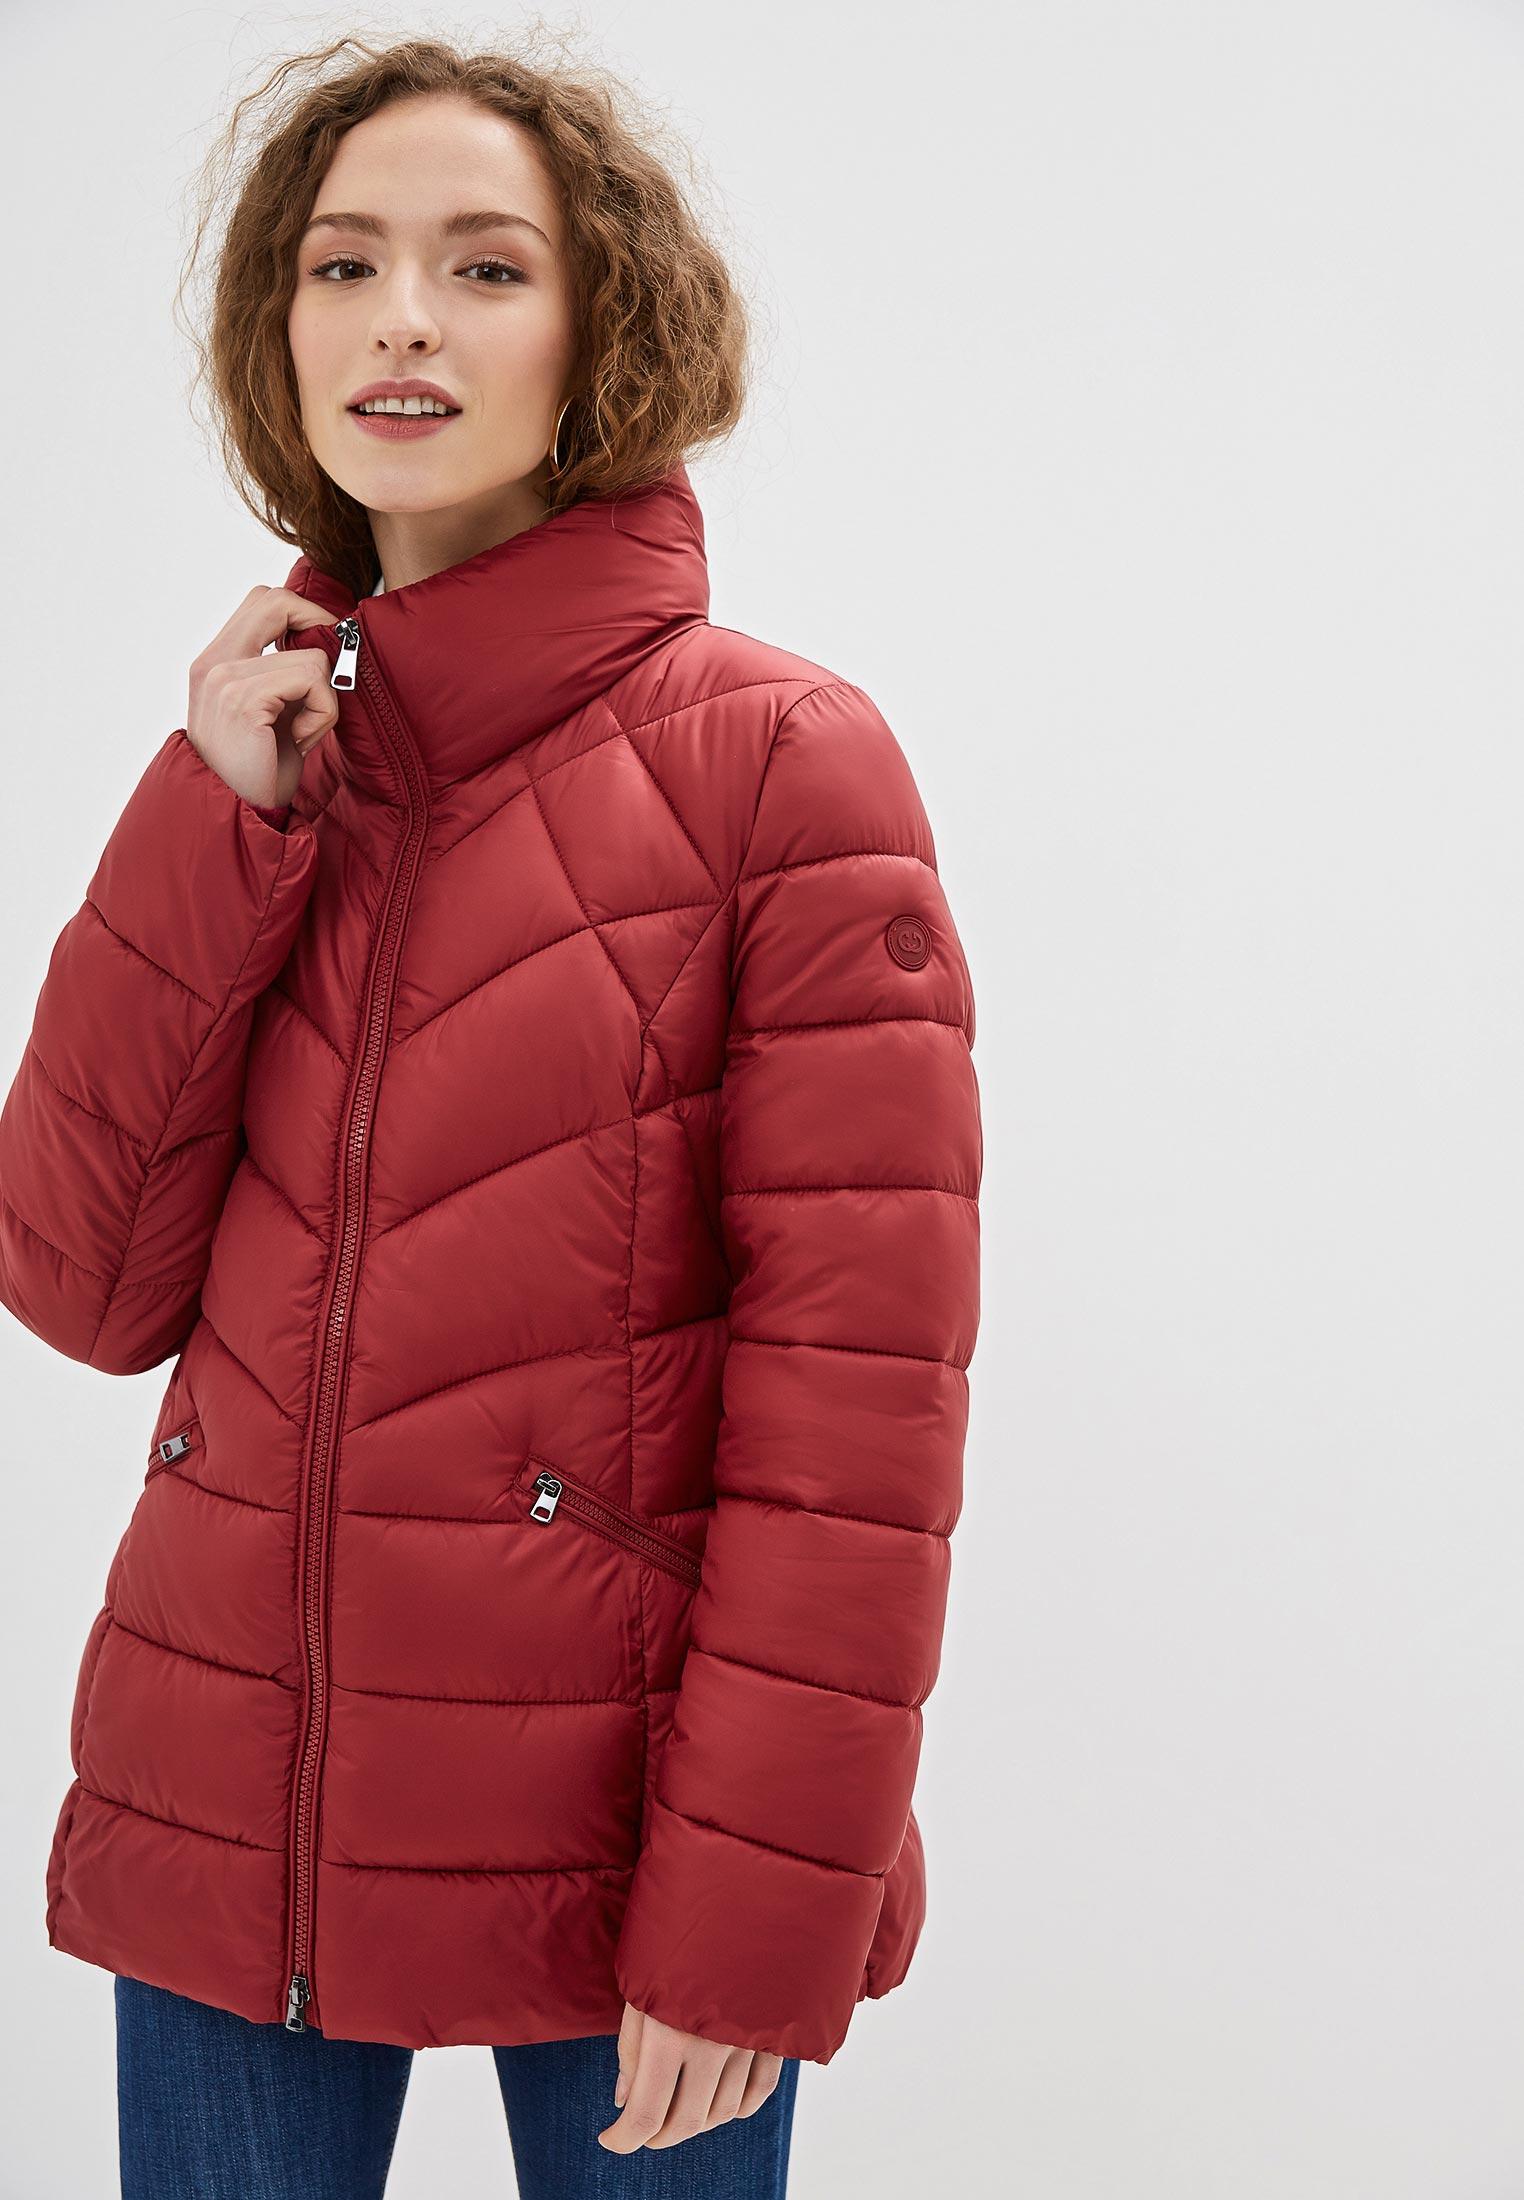 Утепленная куртка Gerry Weber (Гарри Вебер) 95087-31127